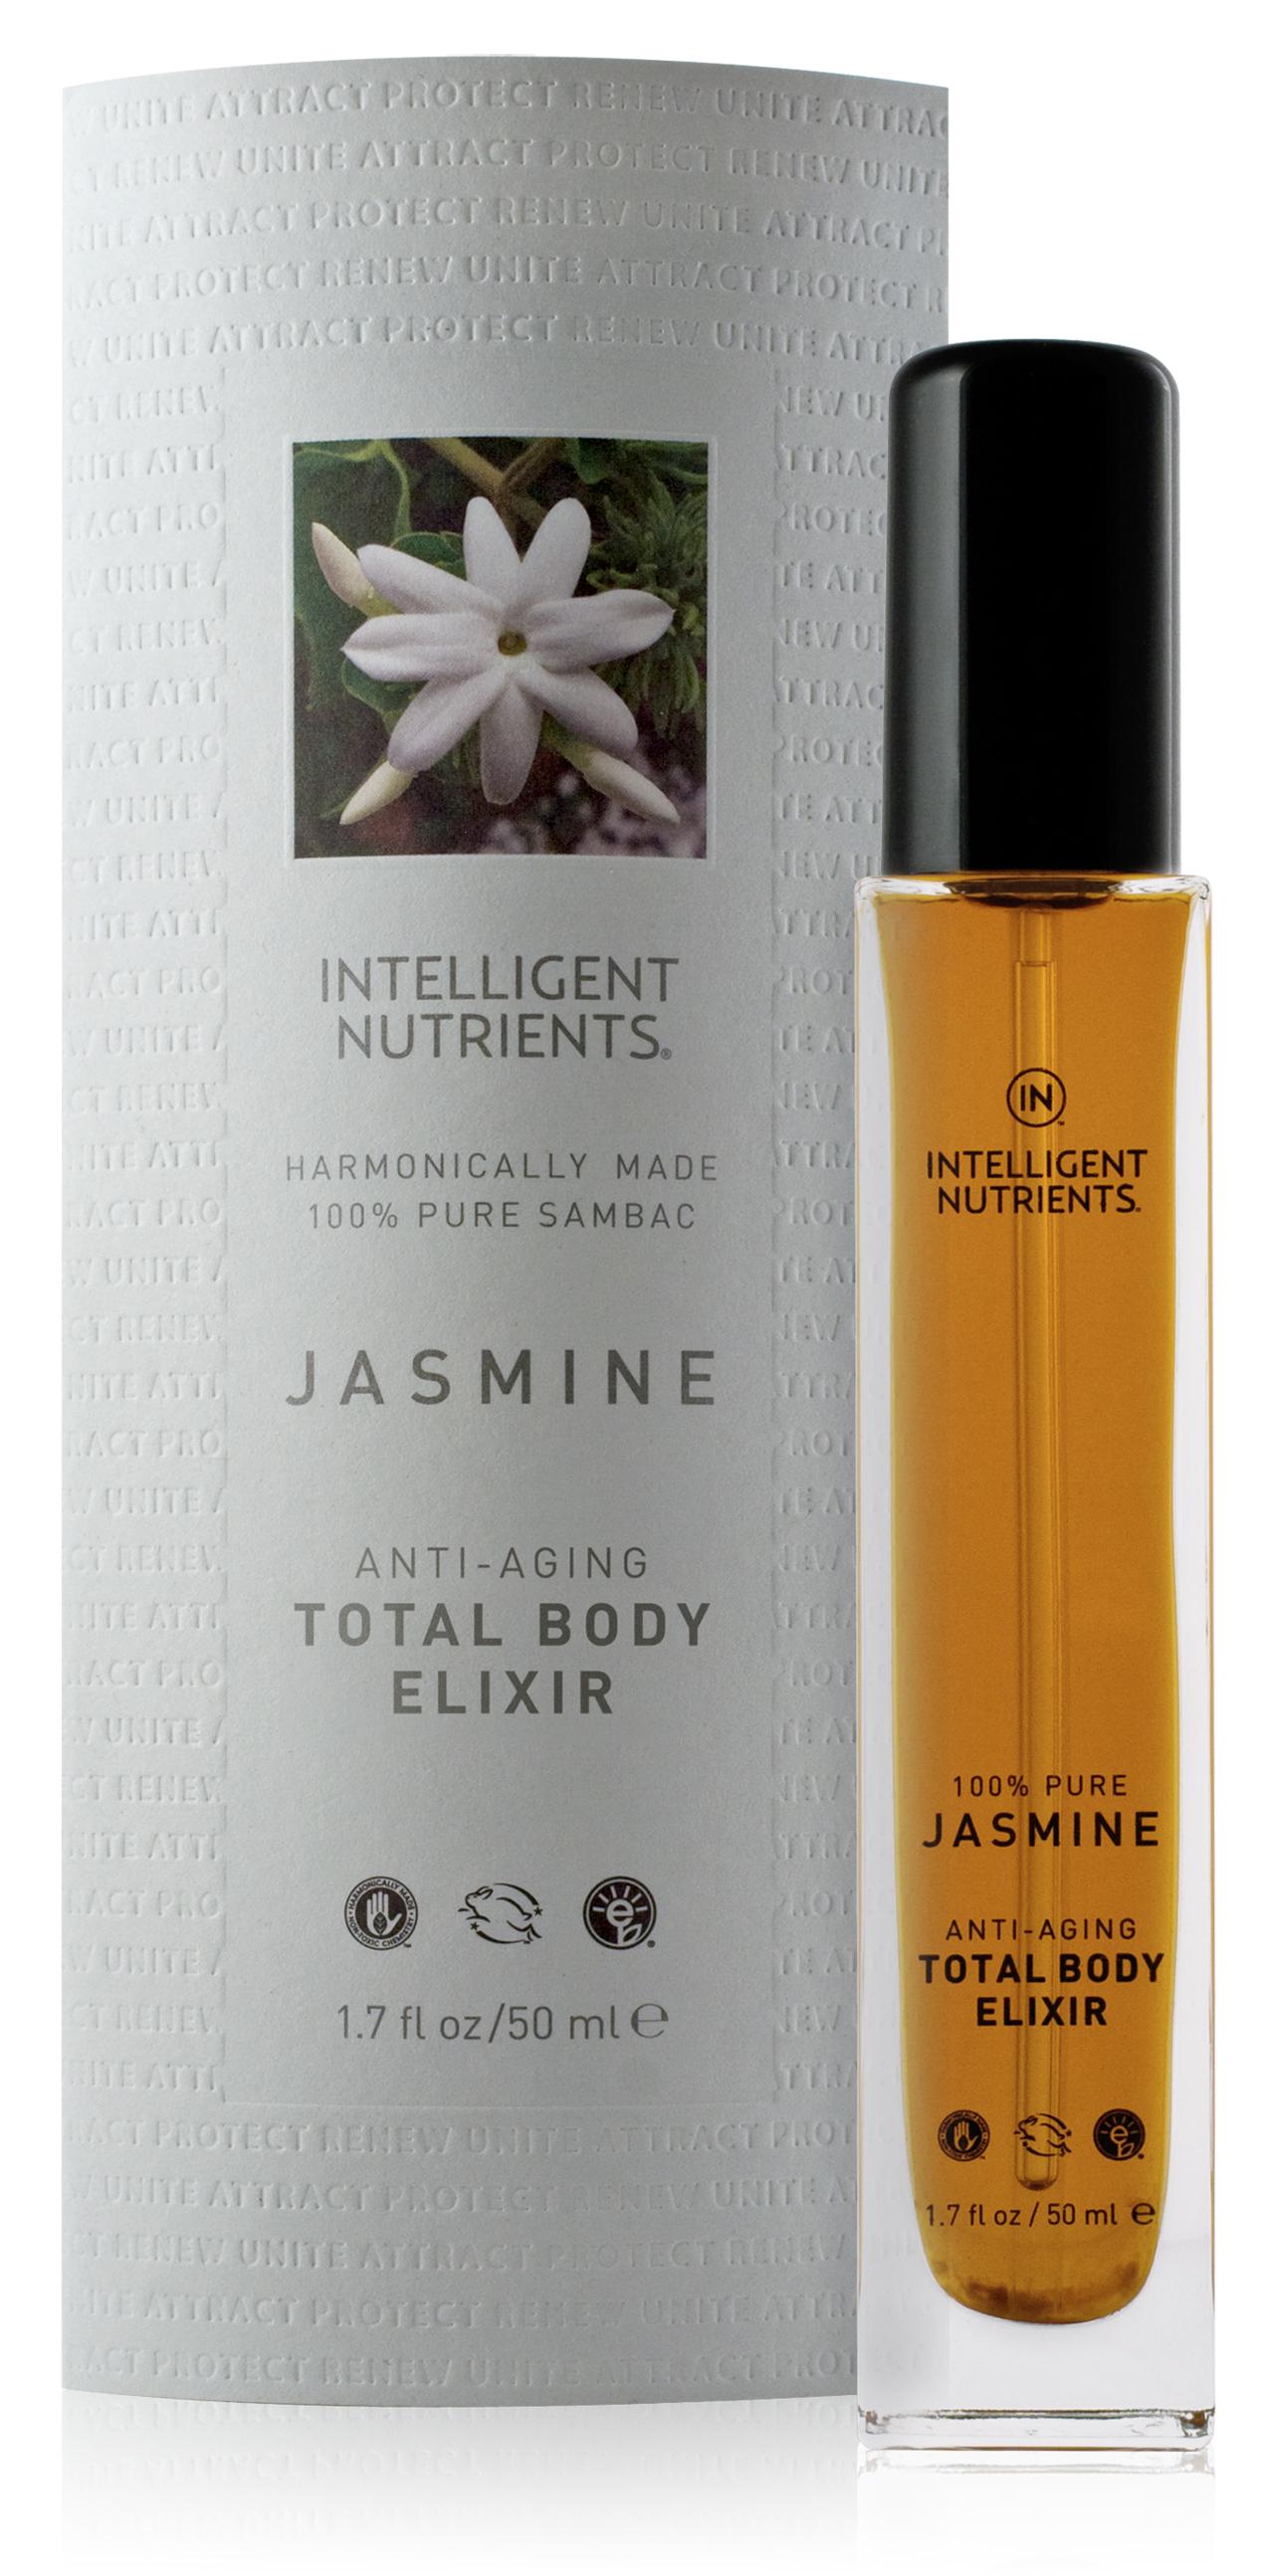 Jasmine Total Body Elixir (DKK715/50ml)